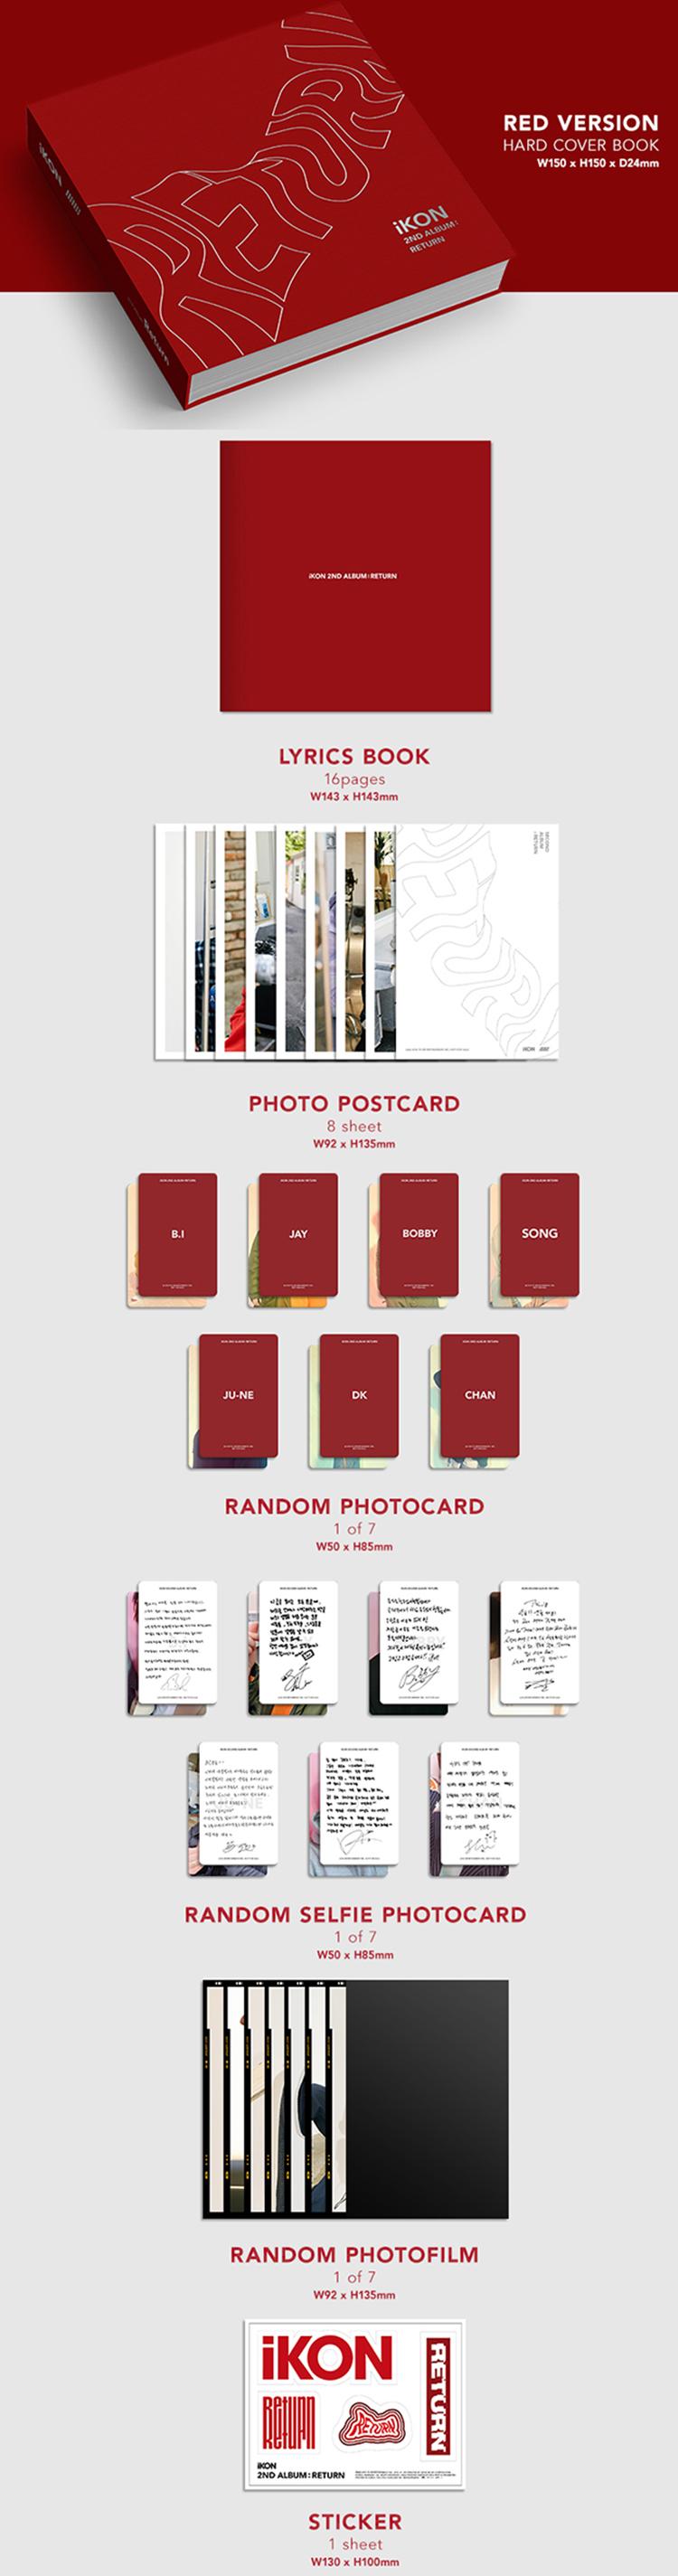 iKON 2nd Album : Return